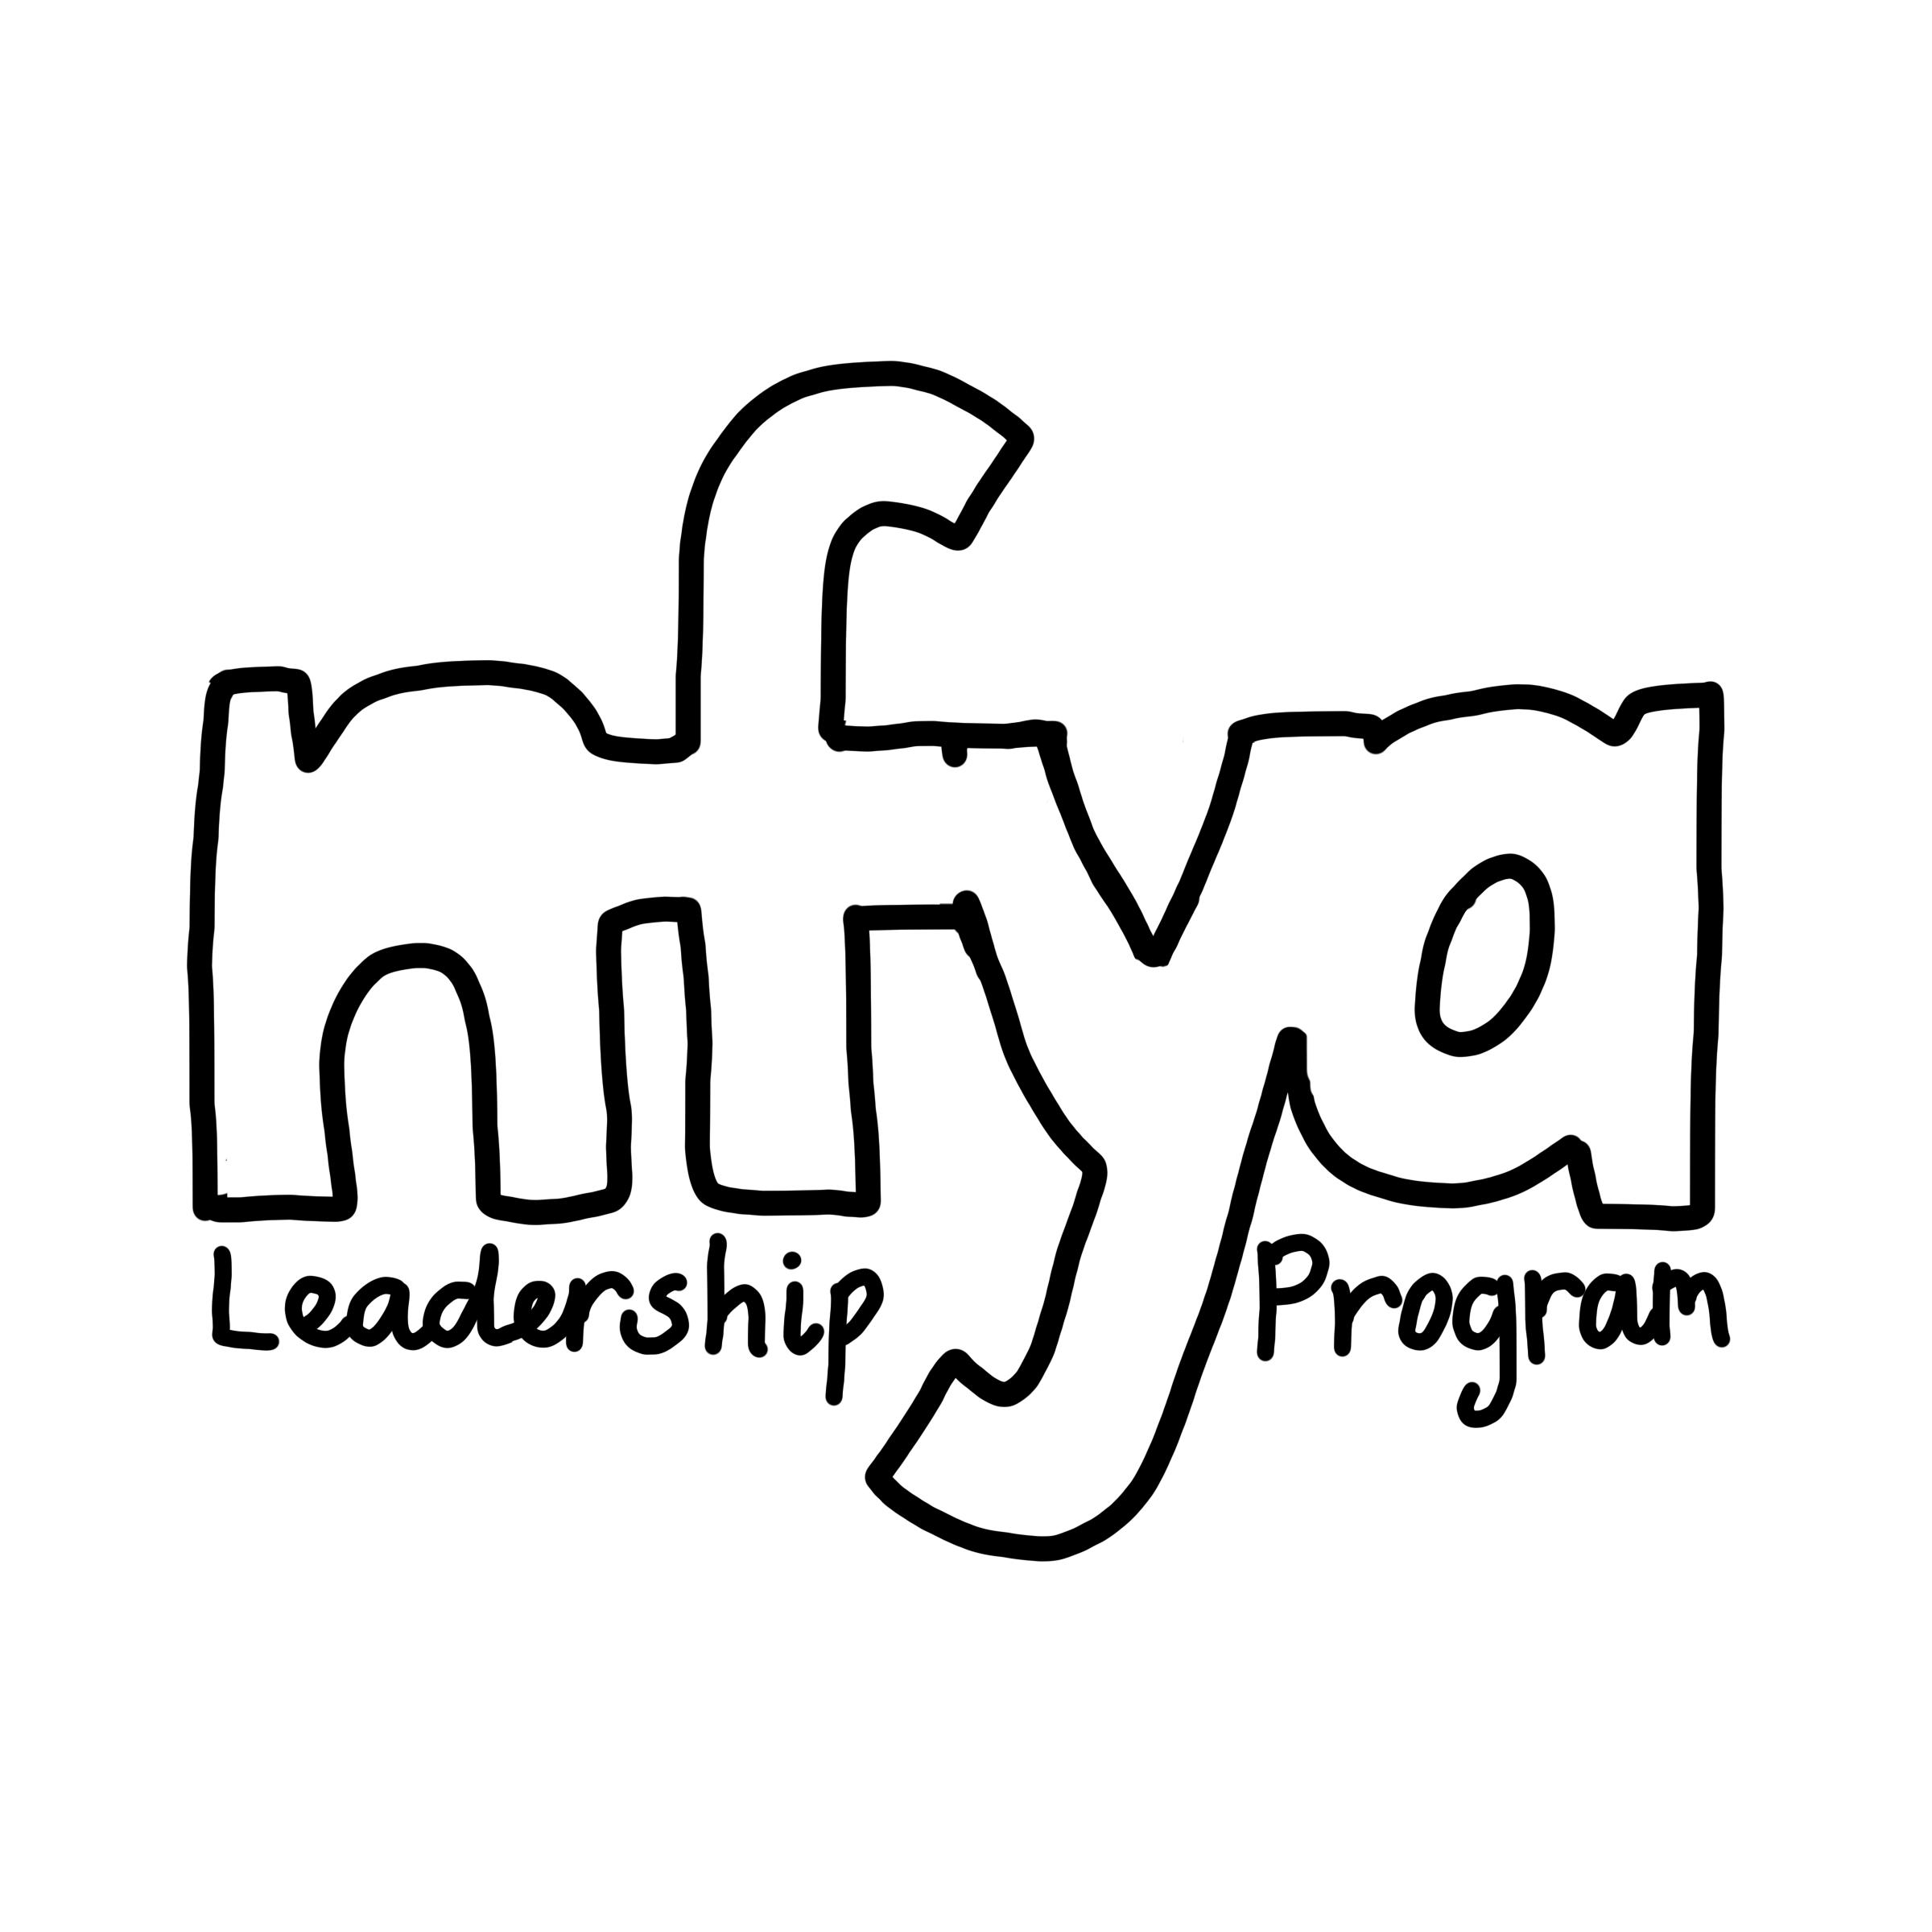 NFYA Leadership Program Logo